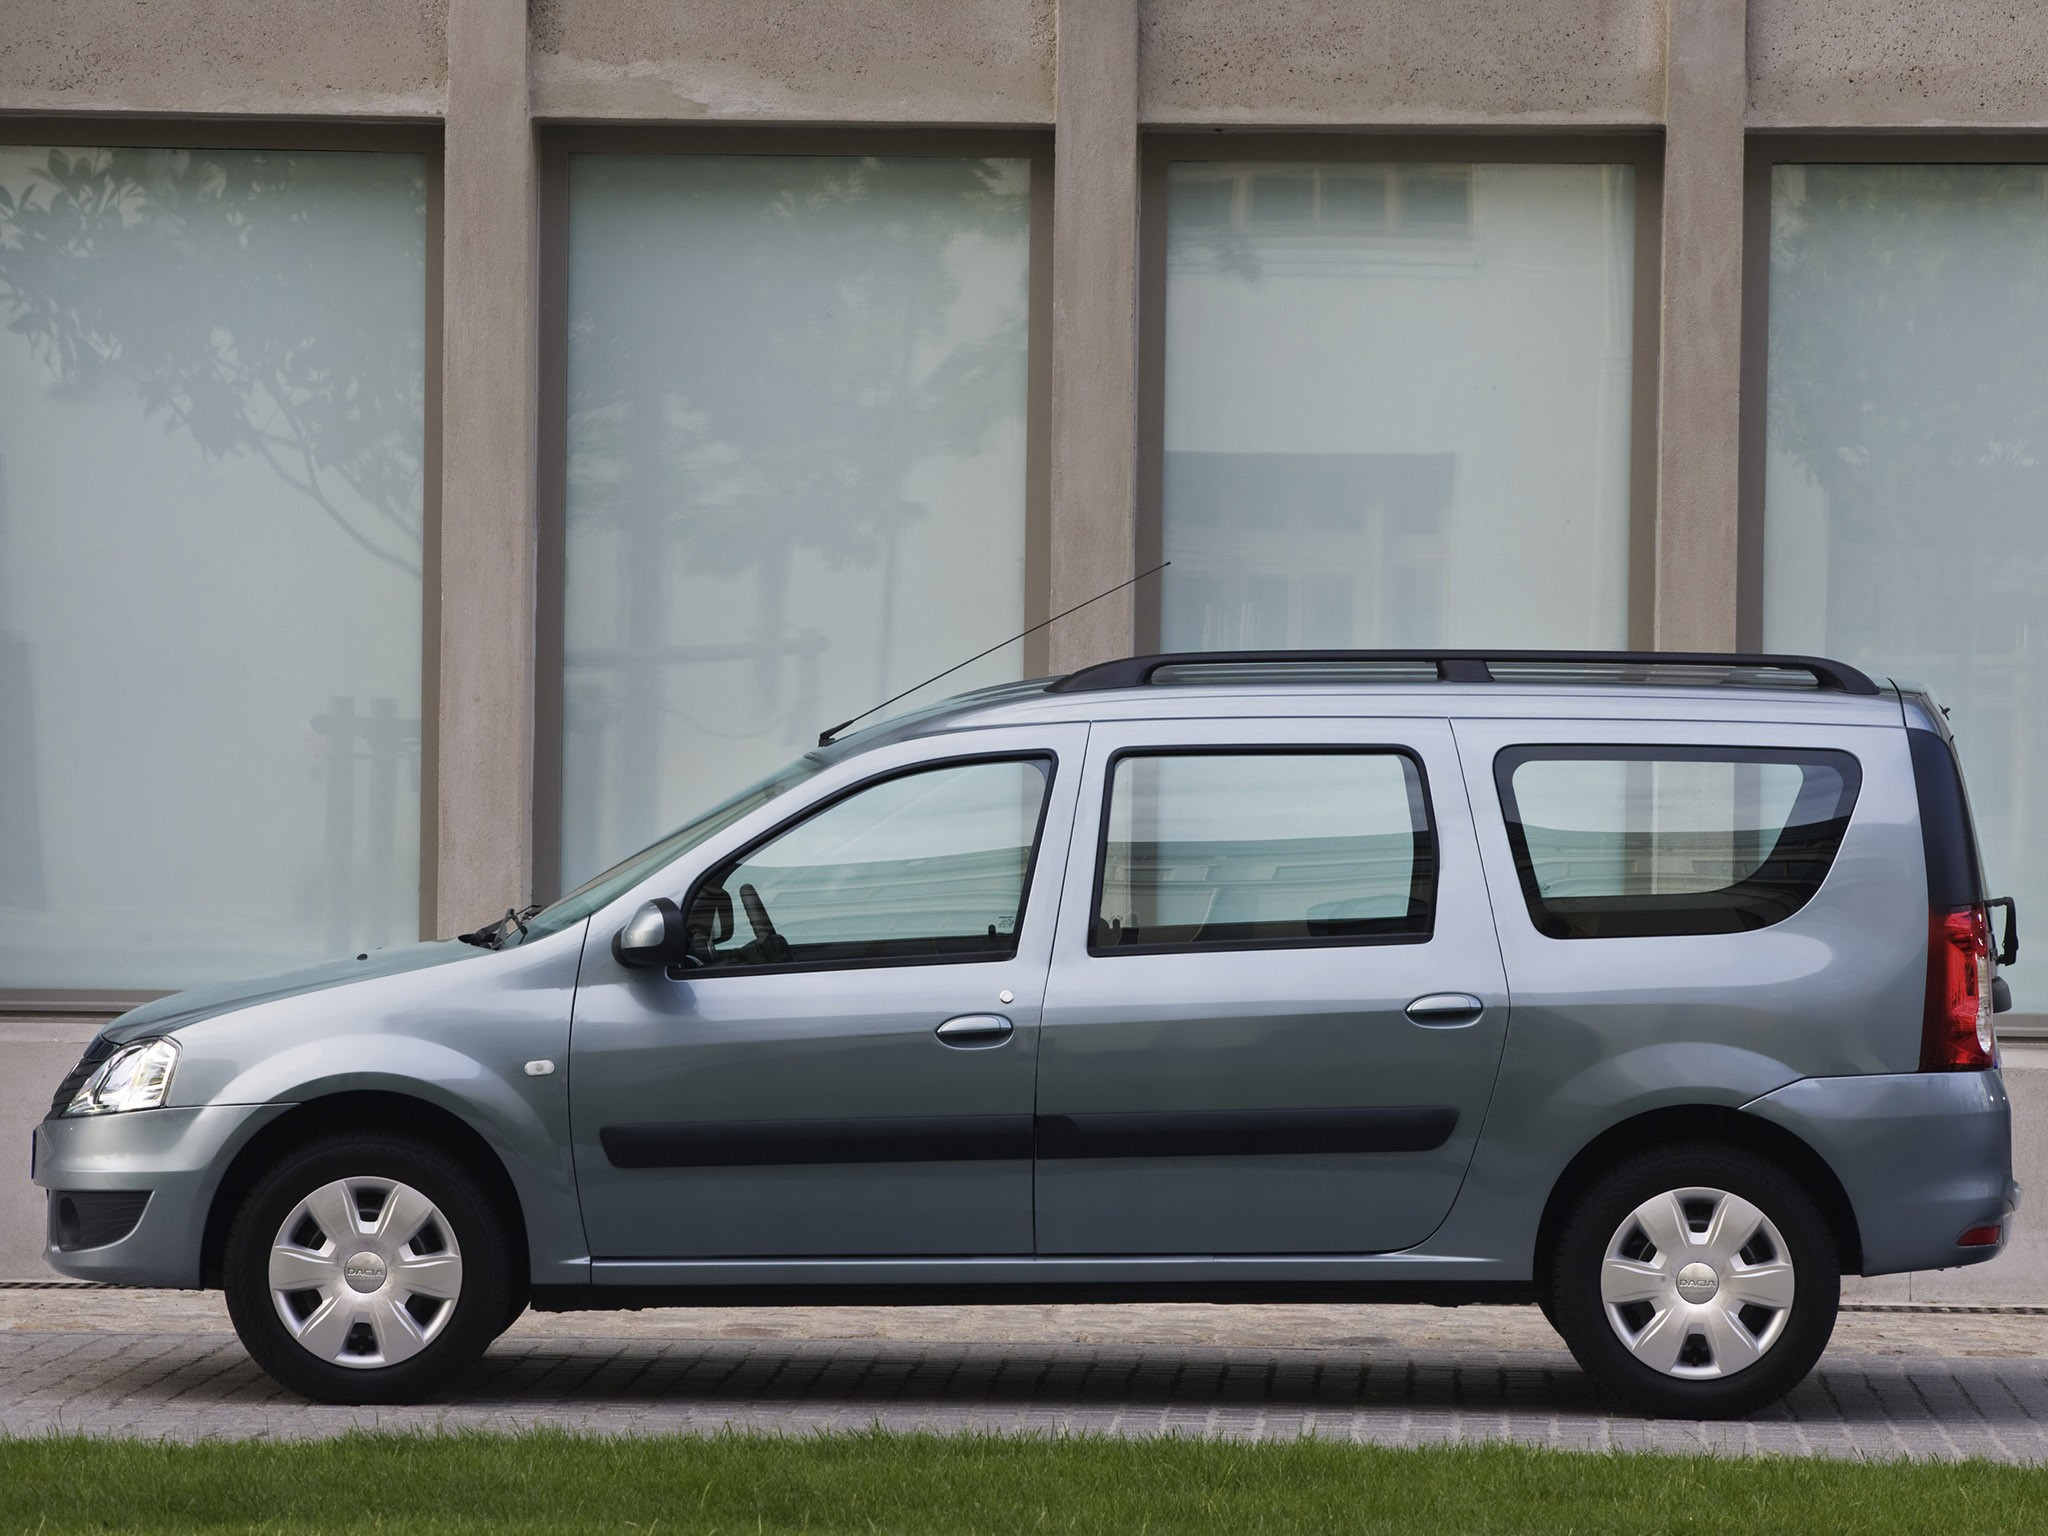 Dacia Sandero Specs >> DACIA Logan MCV specs & photos - 2008, 2009, 2010, 2011, 2012 - autoevolution